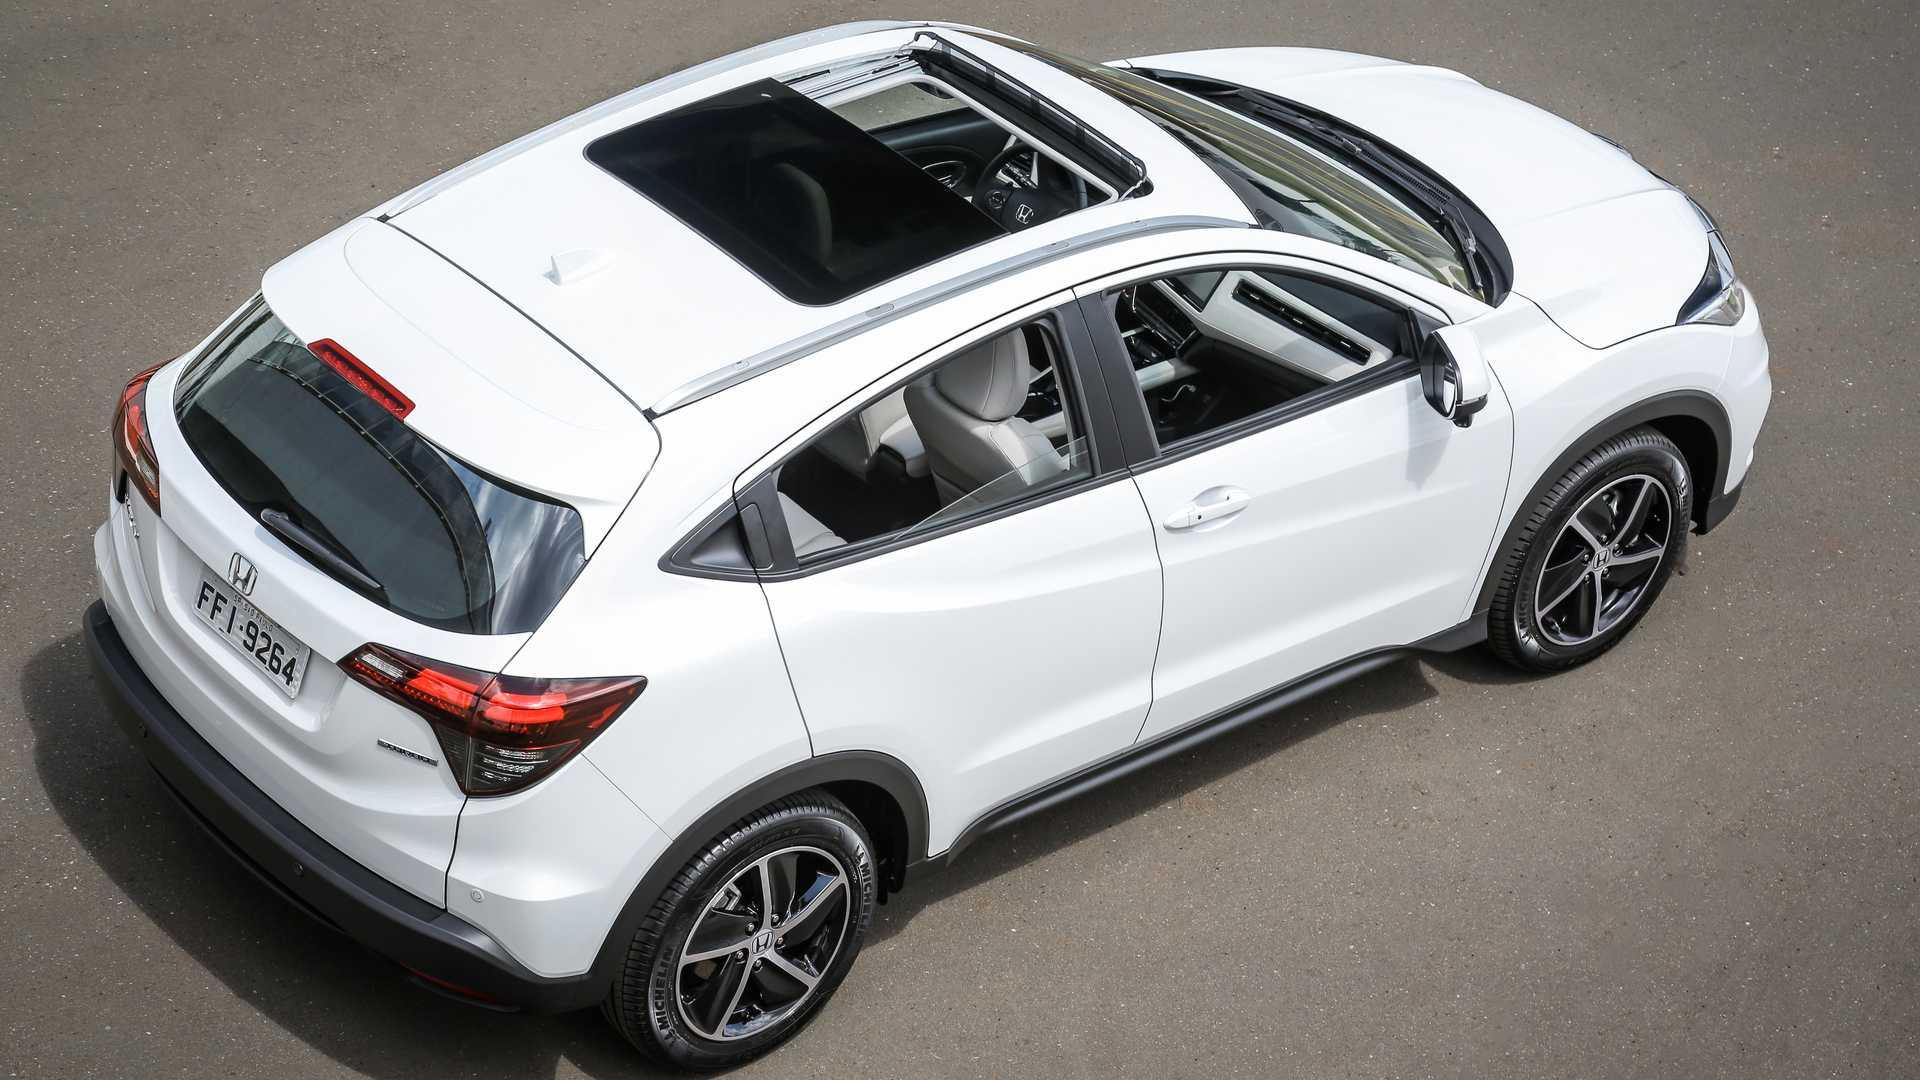 54 All New Honda Hrv Turbo 2020 Interior with Honda Hrv Turbo 2020